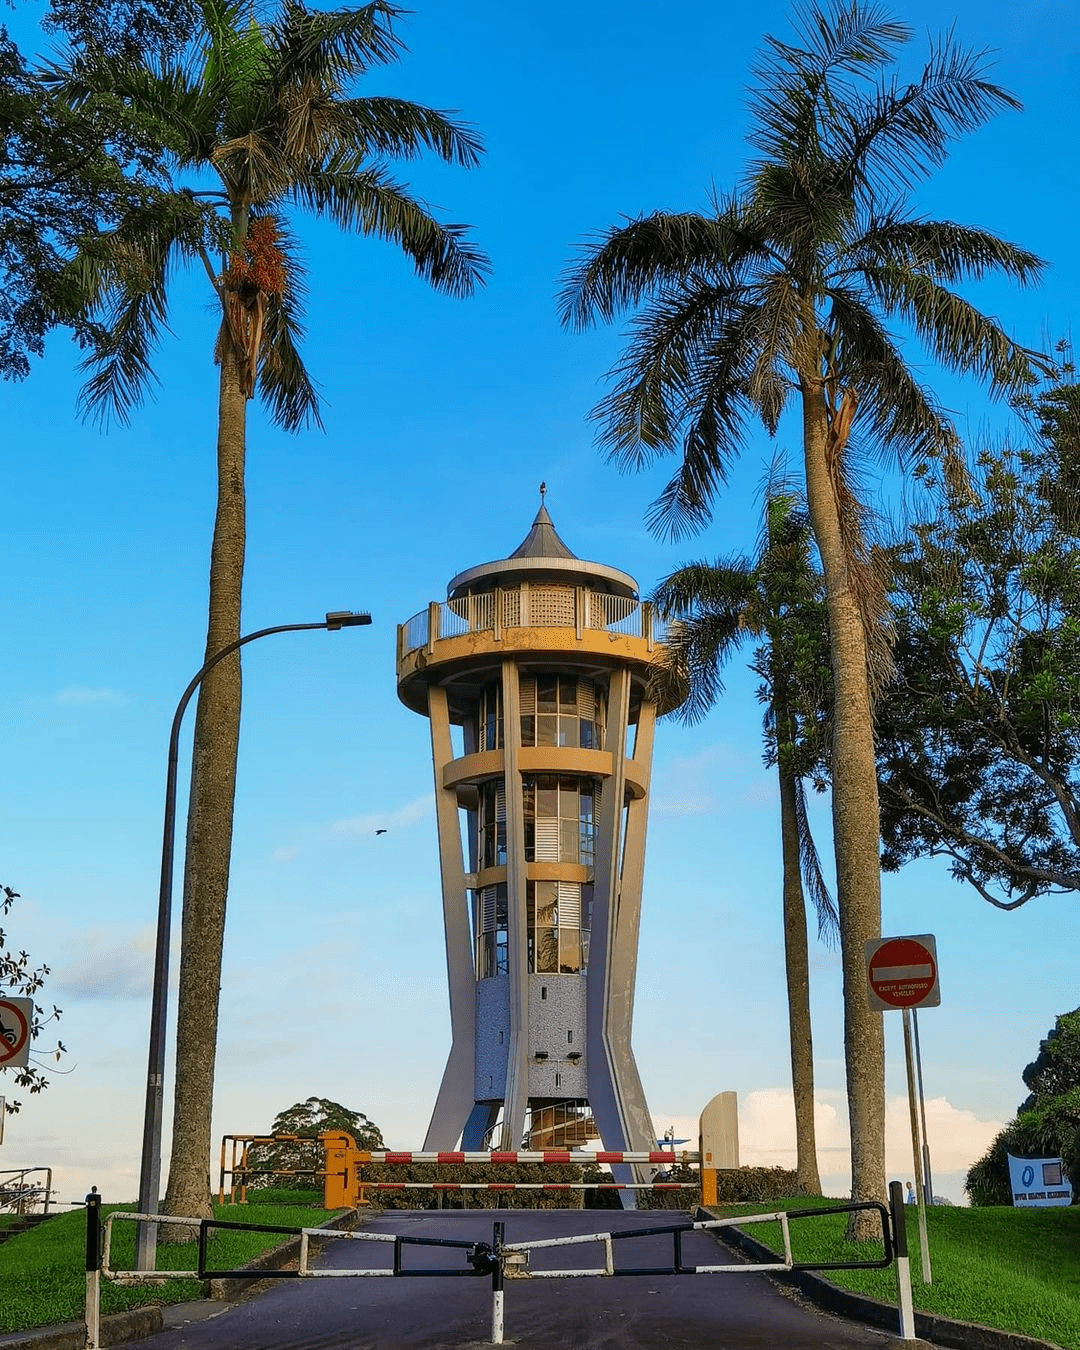 Upper Seletar Reservoir Park - Rocket Tower